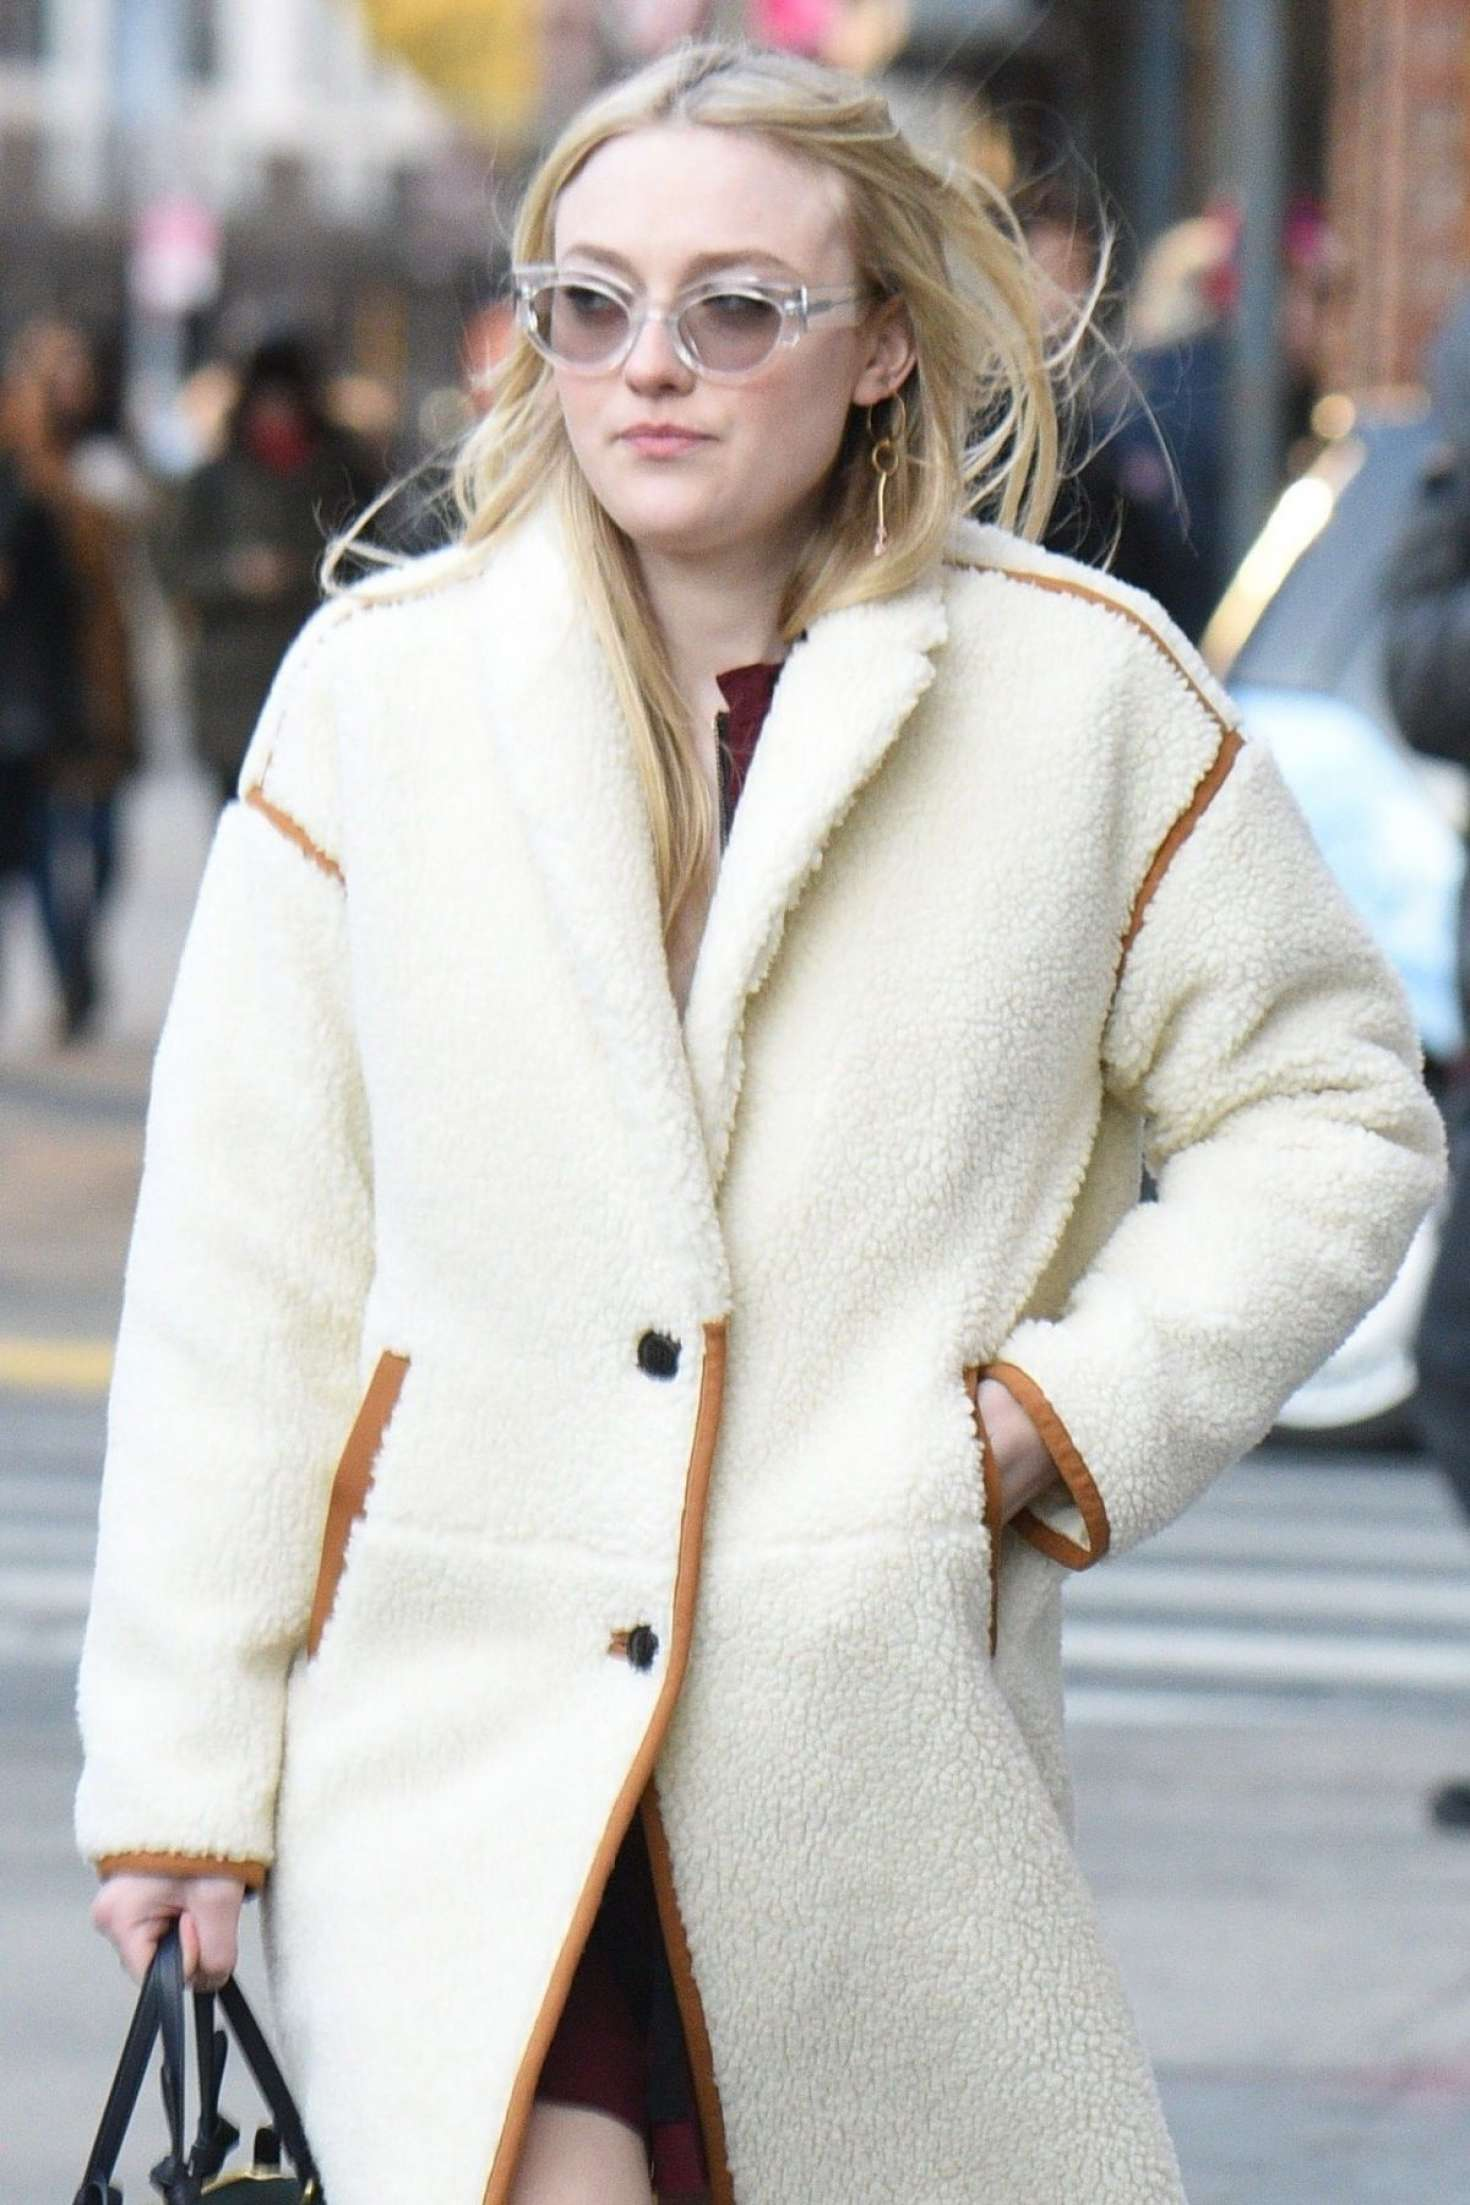 Dakota Fanning in White Coat - Out in NYC